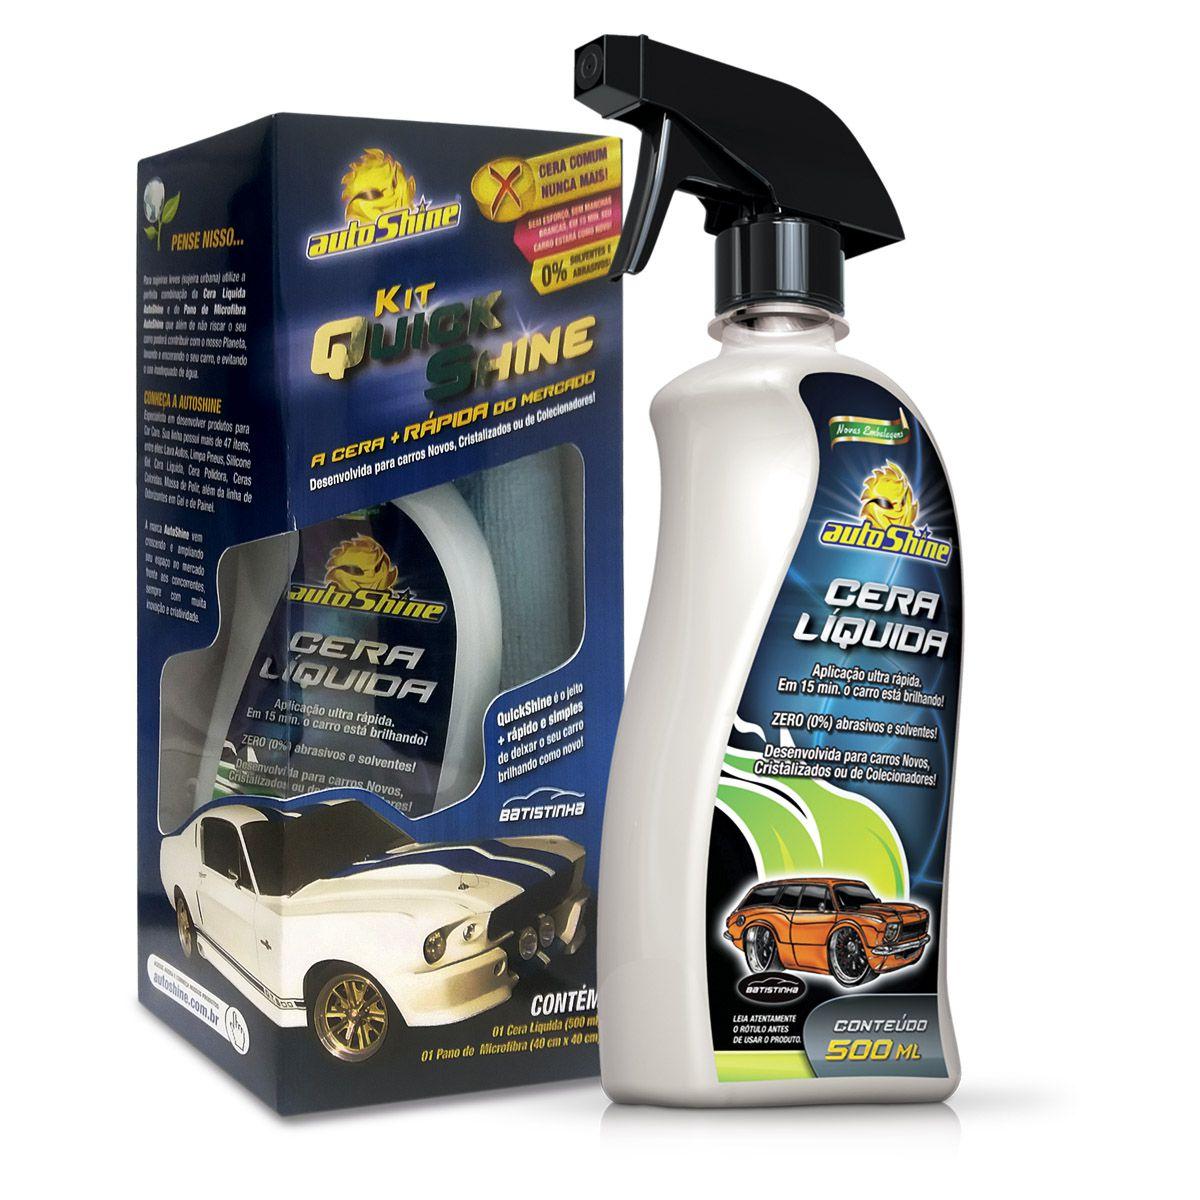 Kit Quick Shine Cera Líquida e Pano de Microfibra Autoshine